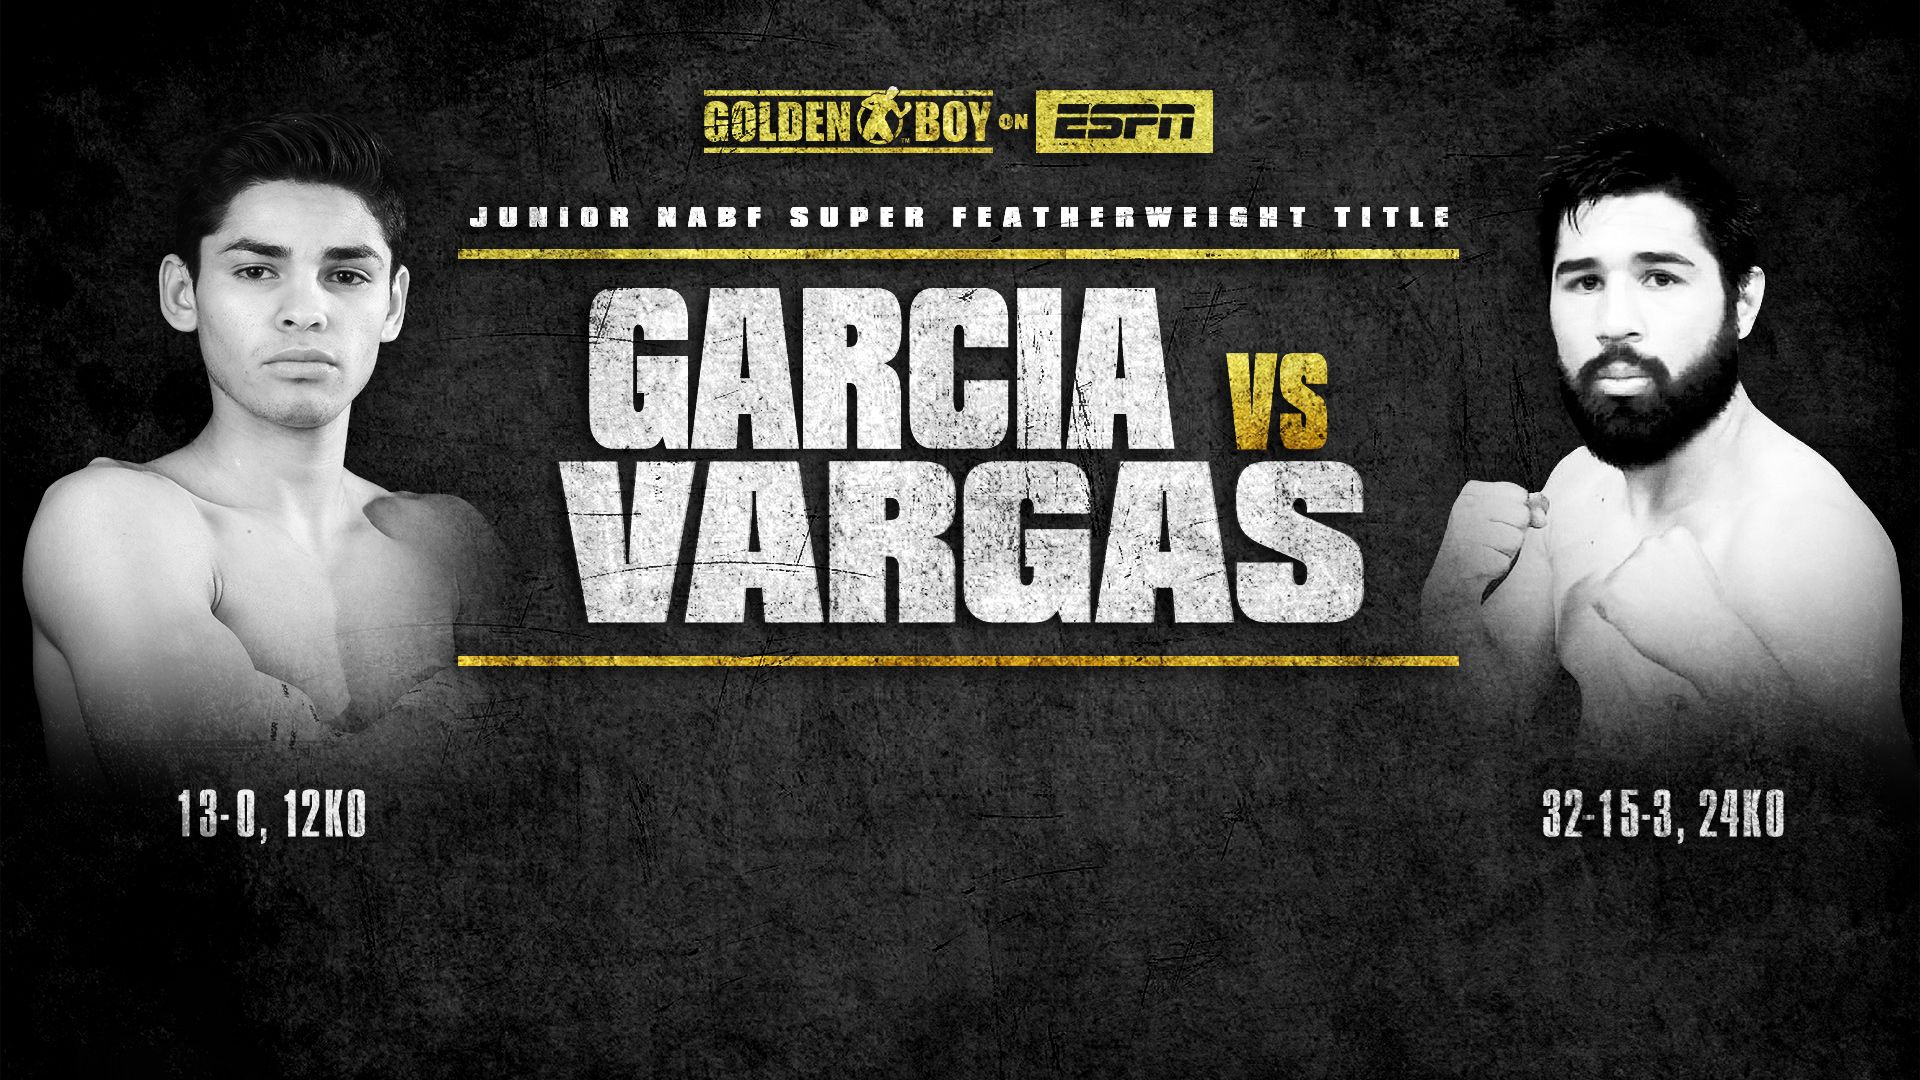 Ryan Garcia vs. Fernando Vargas